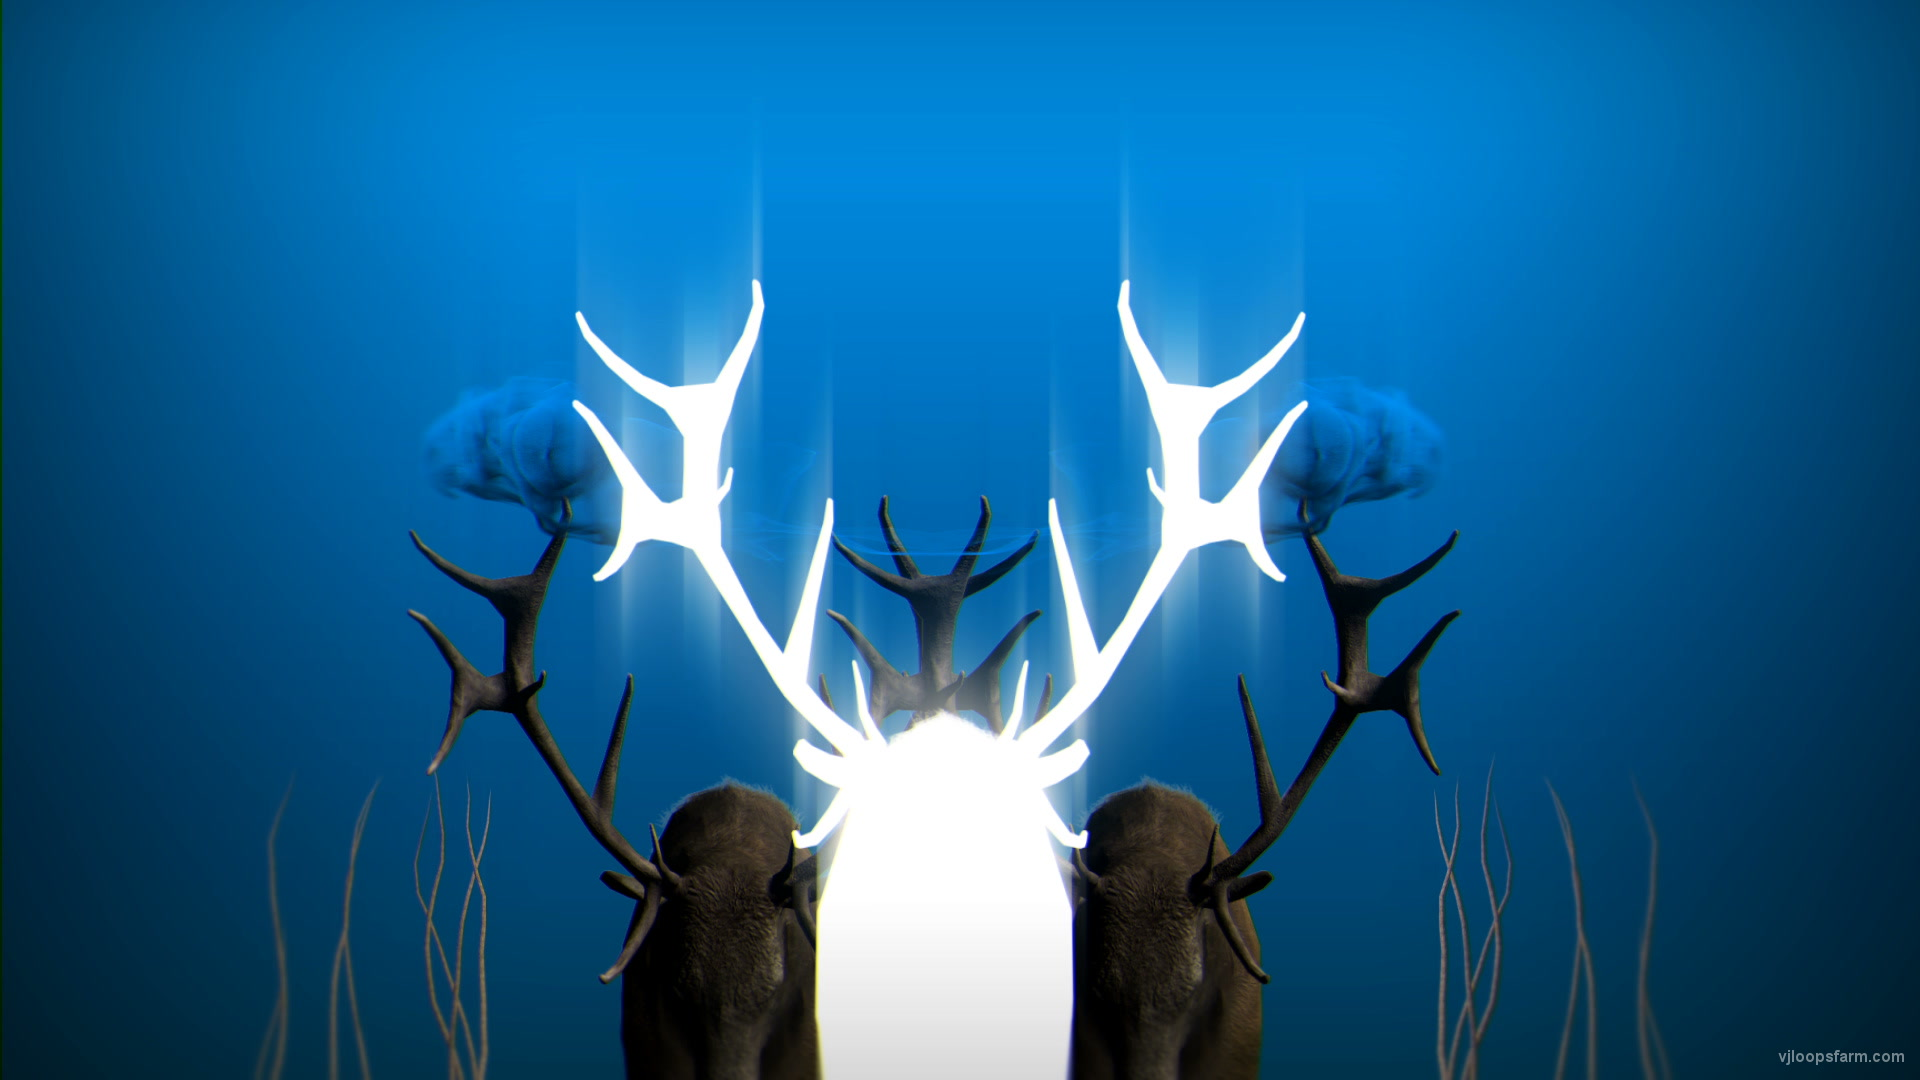 vj video background EDM-Stag-Blue-Beats-Deer-VJ-Loop-LIMEART_003